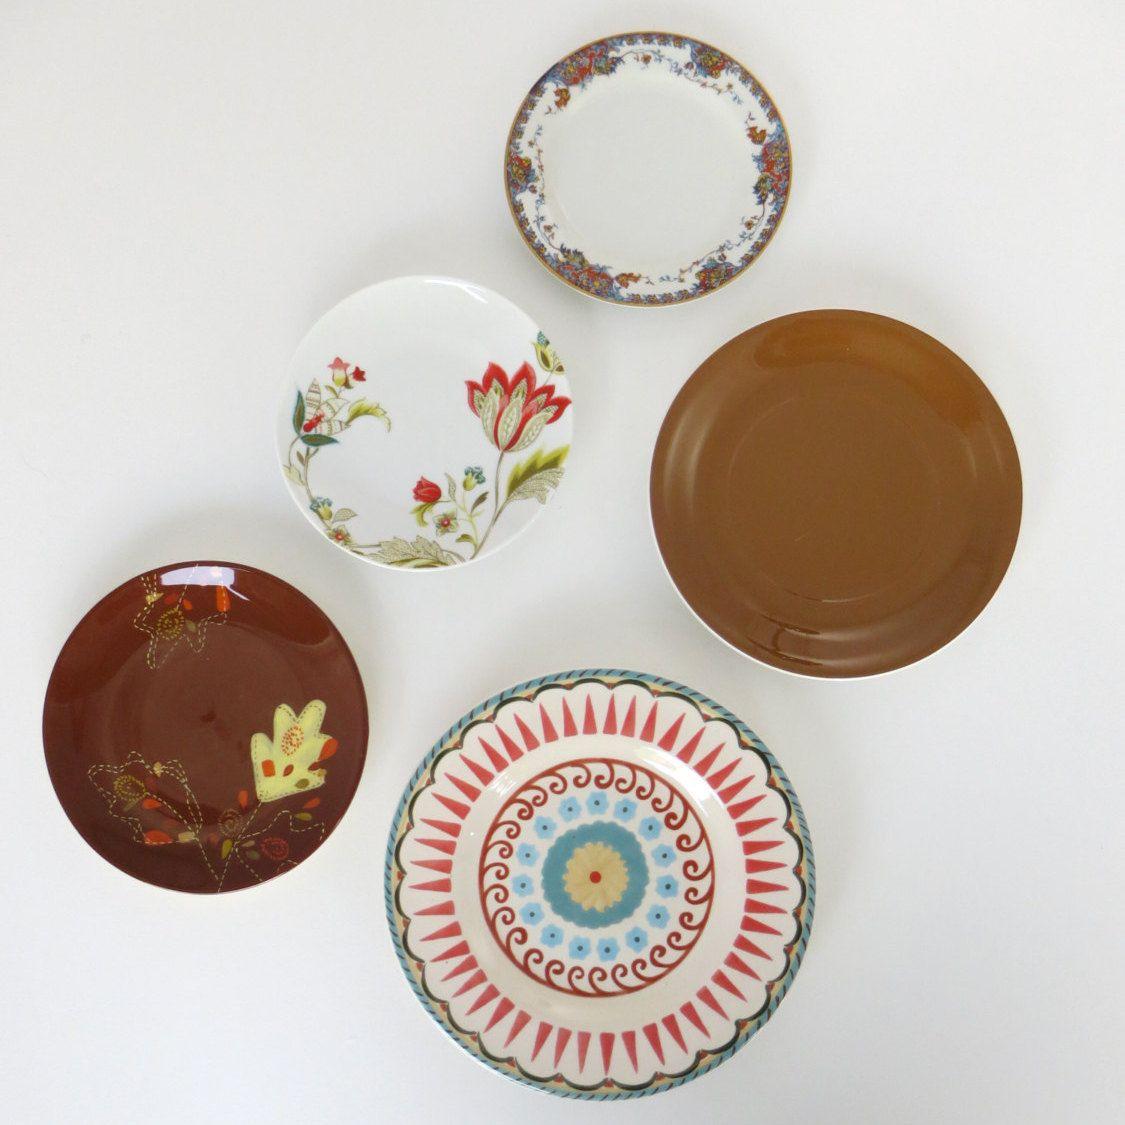 Kitchen Wall Decor, Decorative Plates, Rustic Country, Farmhouse ...